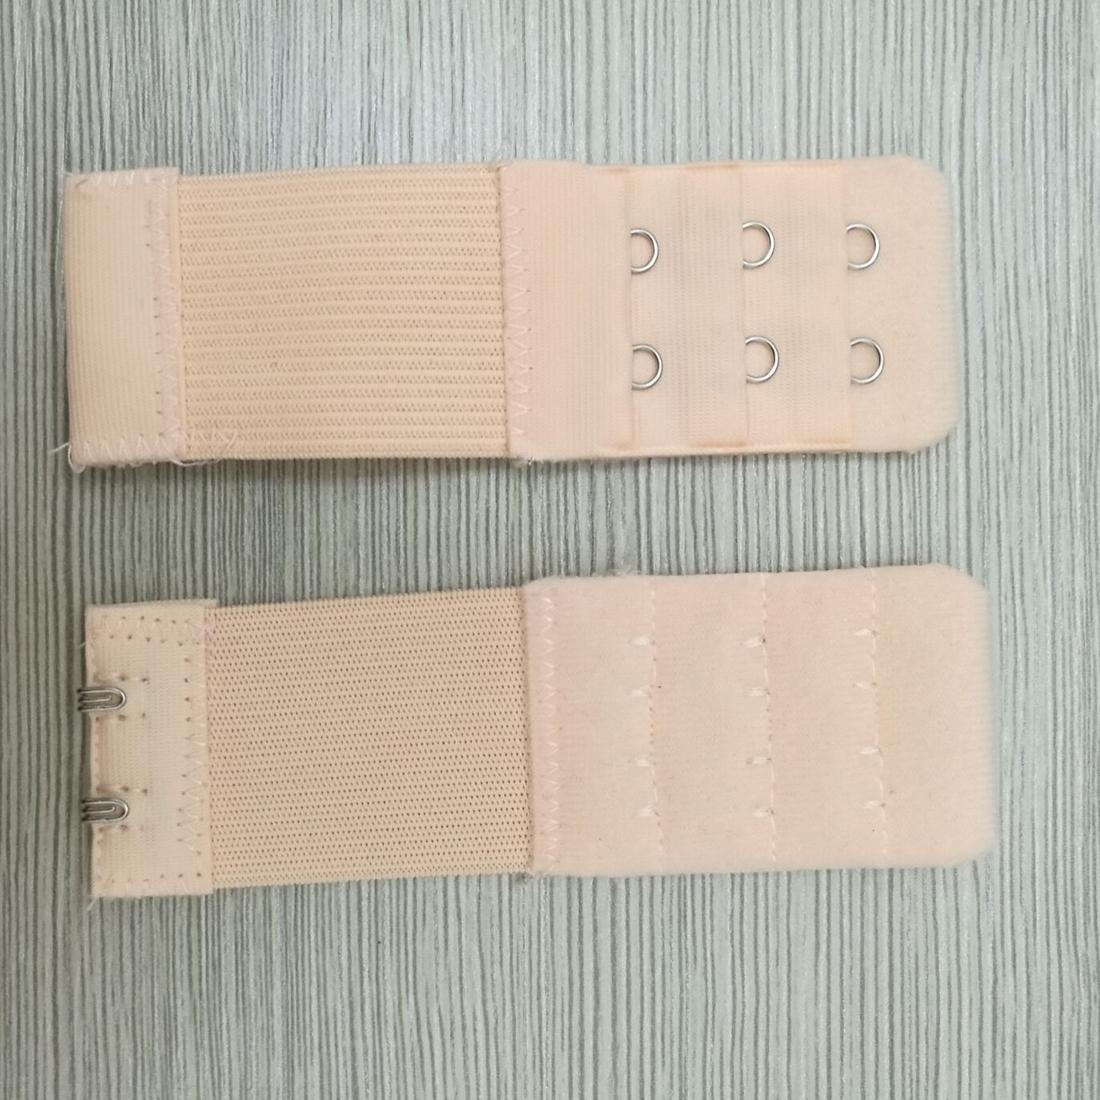 838bb246b5e3a Sexy 4 PCS 2 Hook Bra Extender For Women s Elastic Bra Extension Strap Hook  Clip Expander Adjustable Belt Buckle Underwear